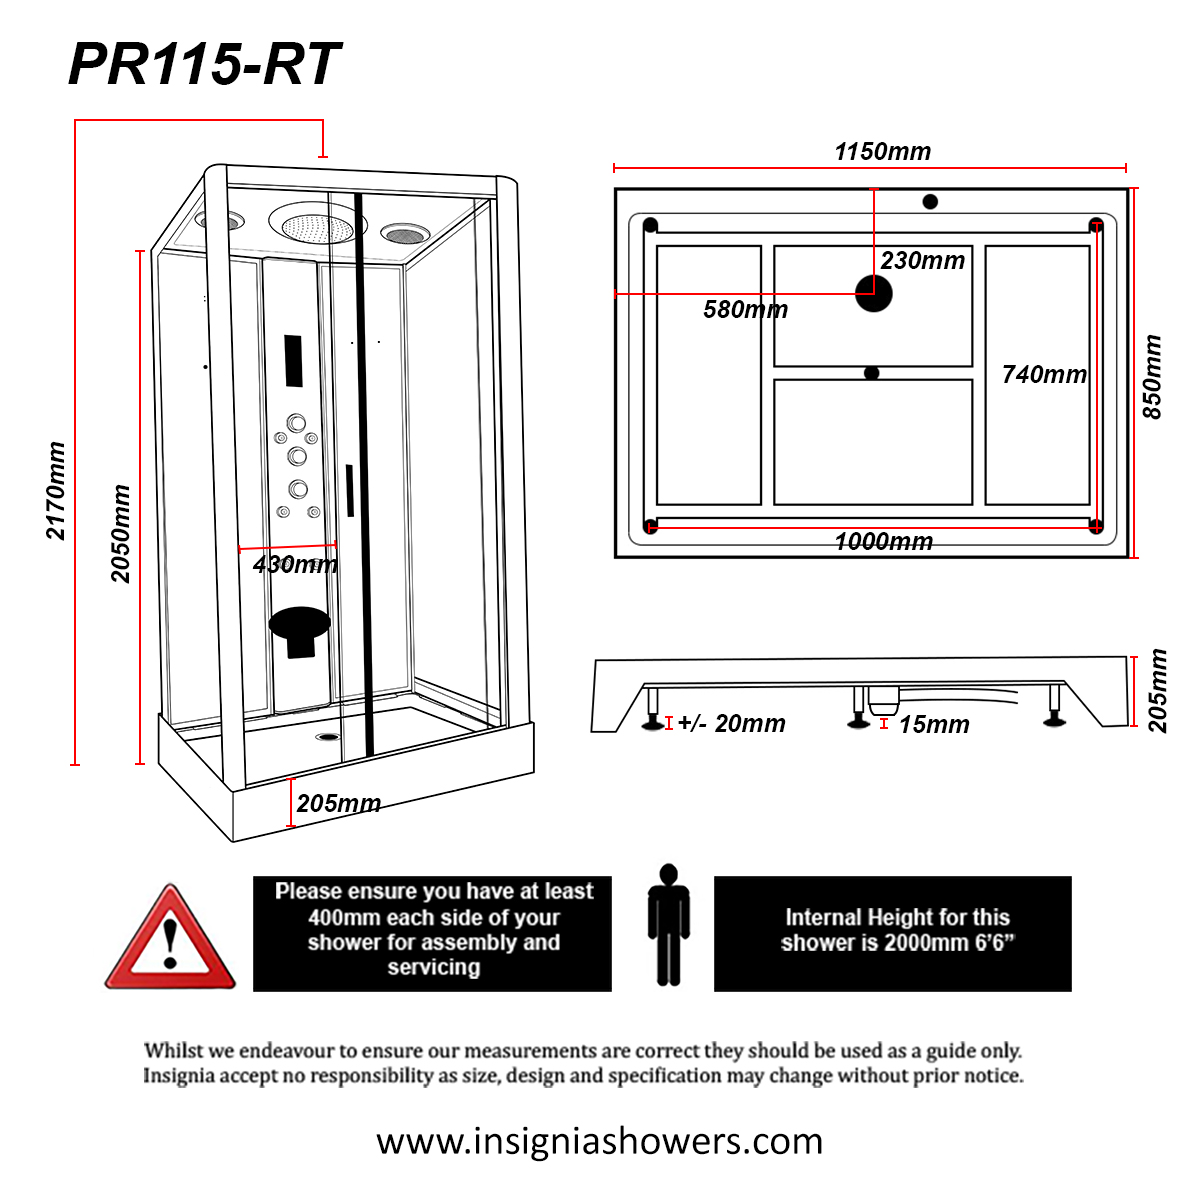 PR115-RT